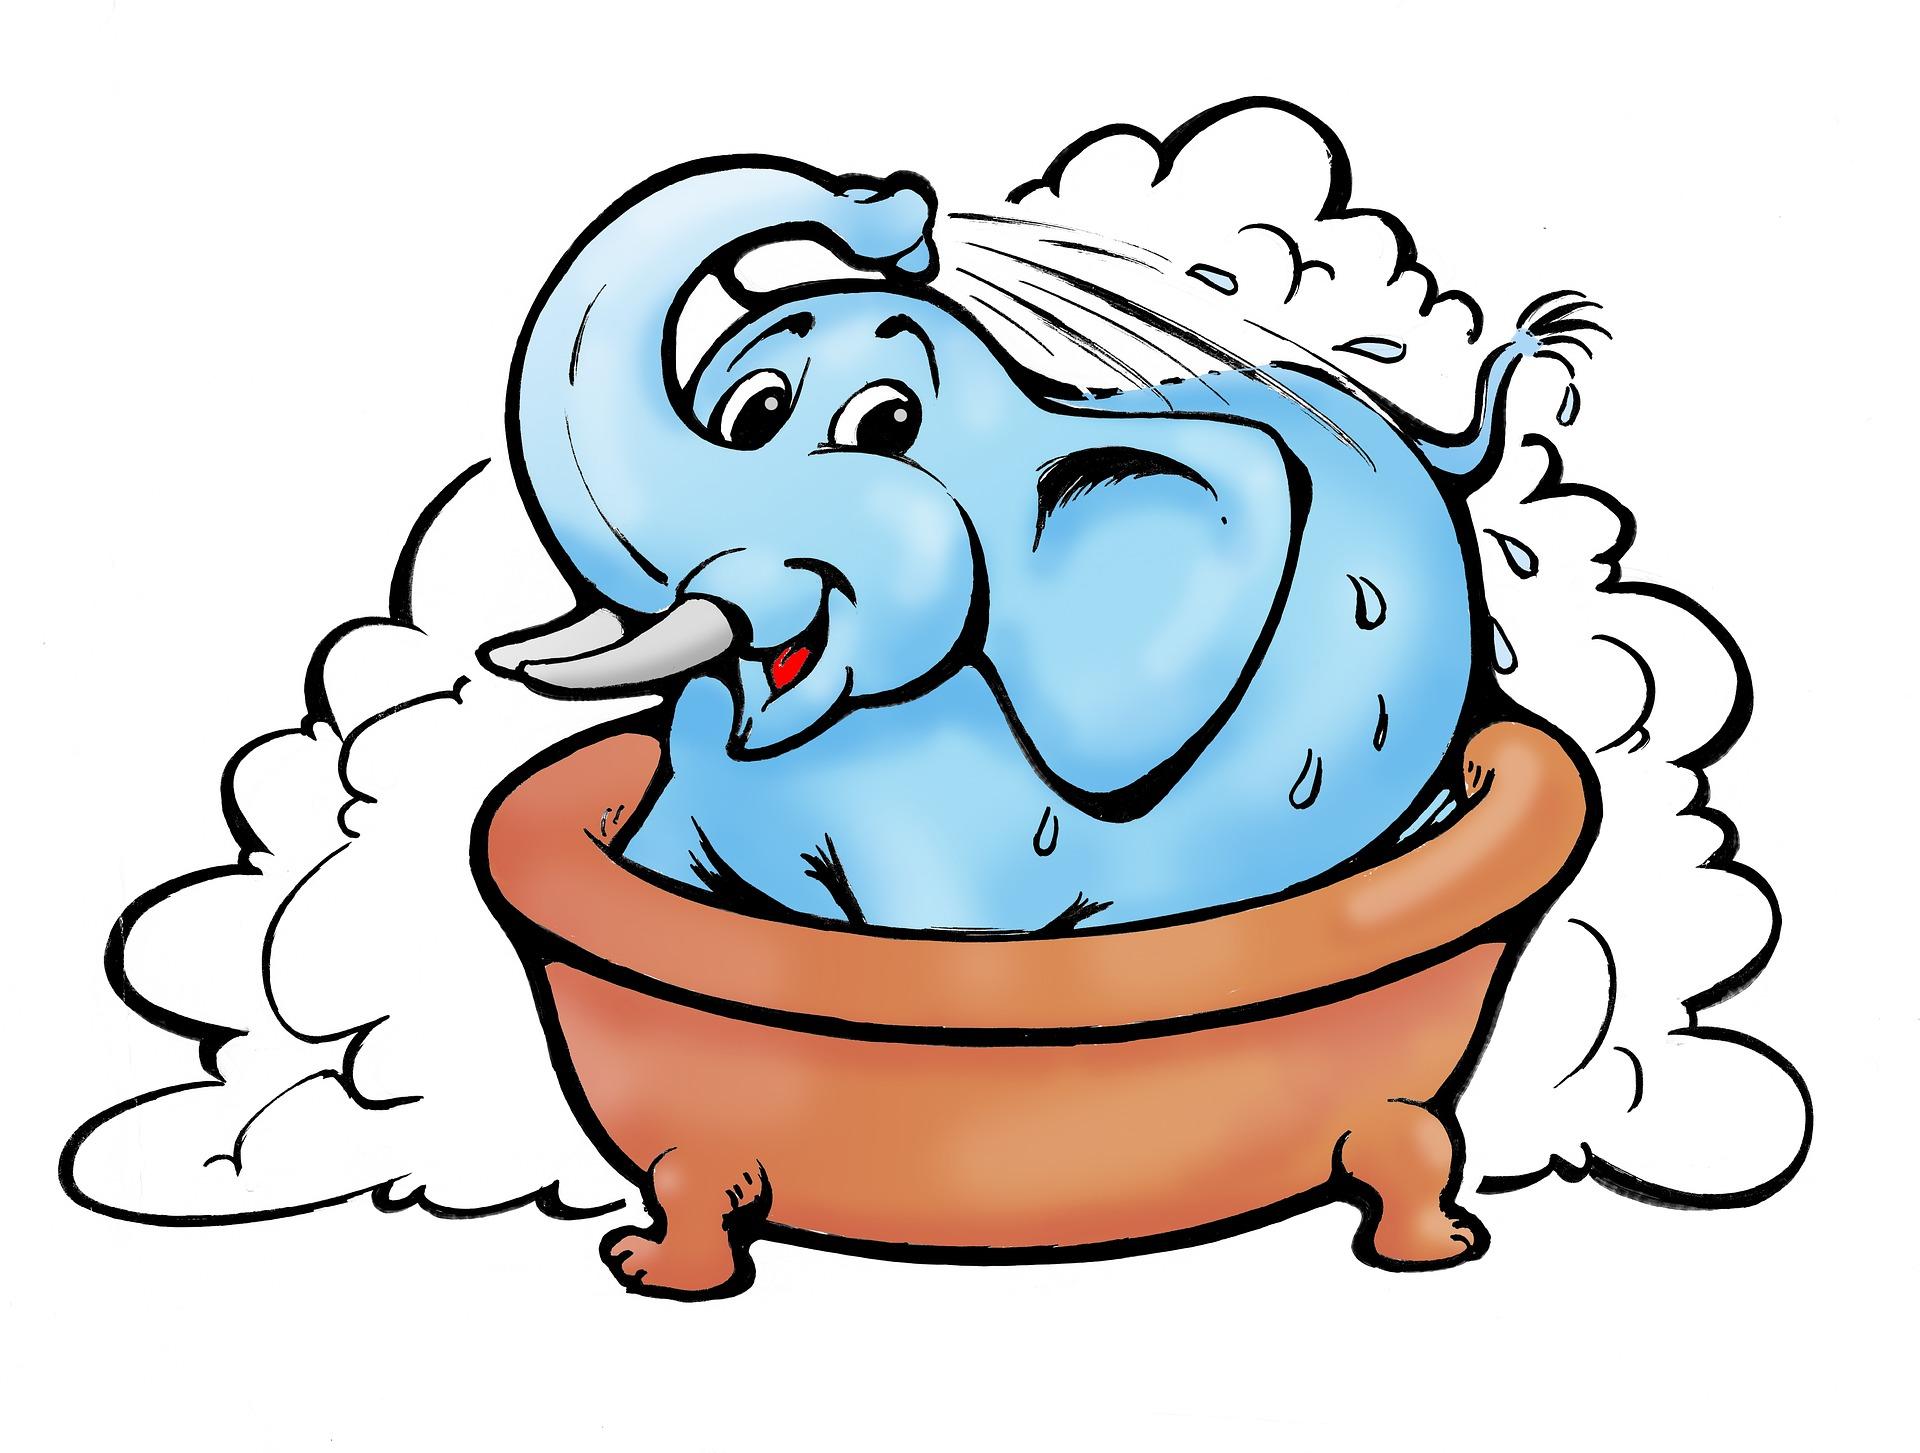 elephant-1830099_1920.jpg